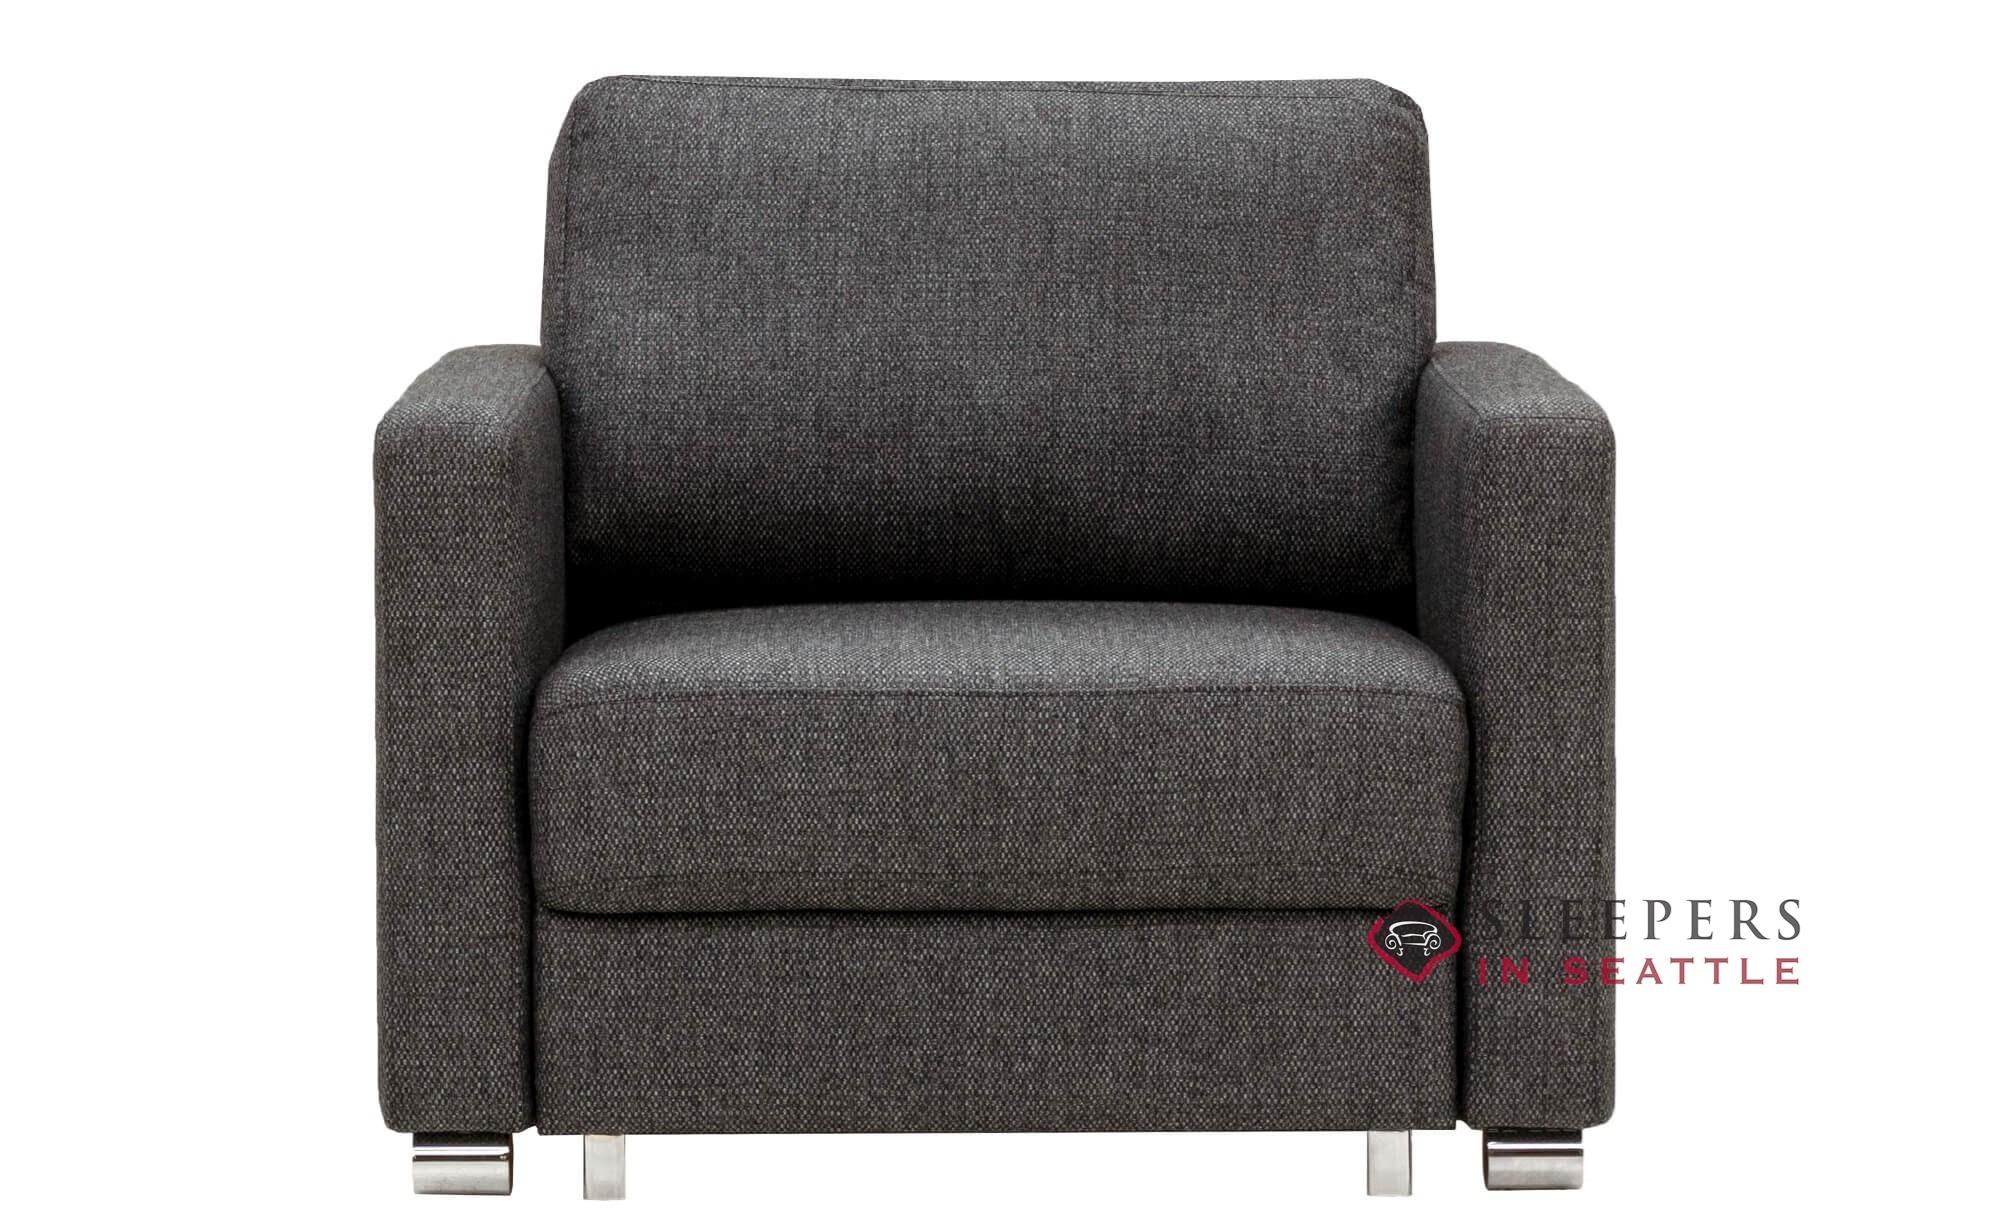 Astounding Luonto Fantasy Chair Sleeper Sofa Creativecarmelina Interior Chair Design Creativecarmelinacom